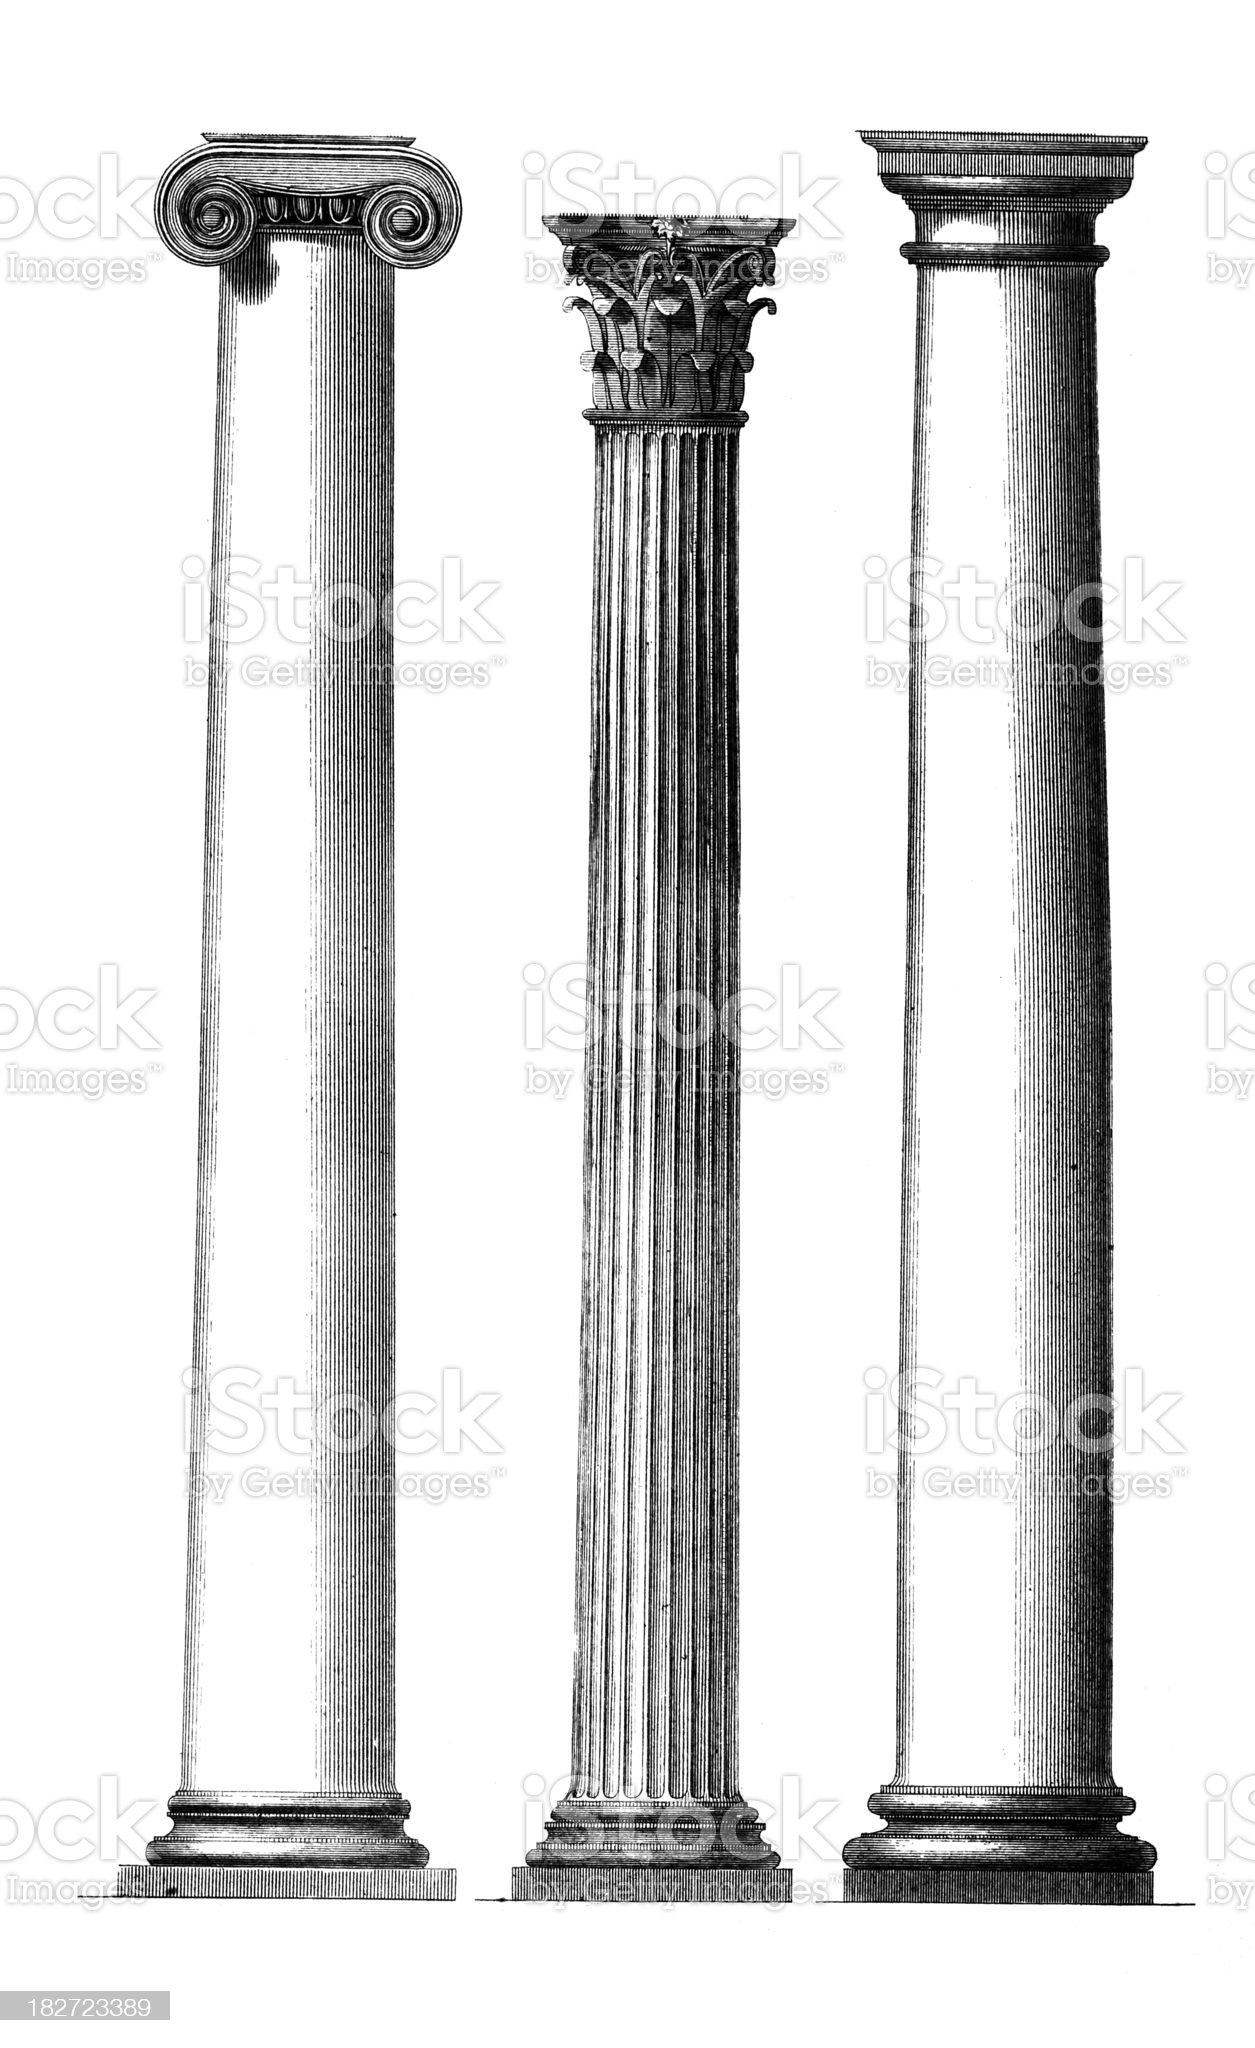 19th century engraving of classical Greek pillars royalty-free stock vector art